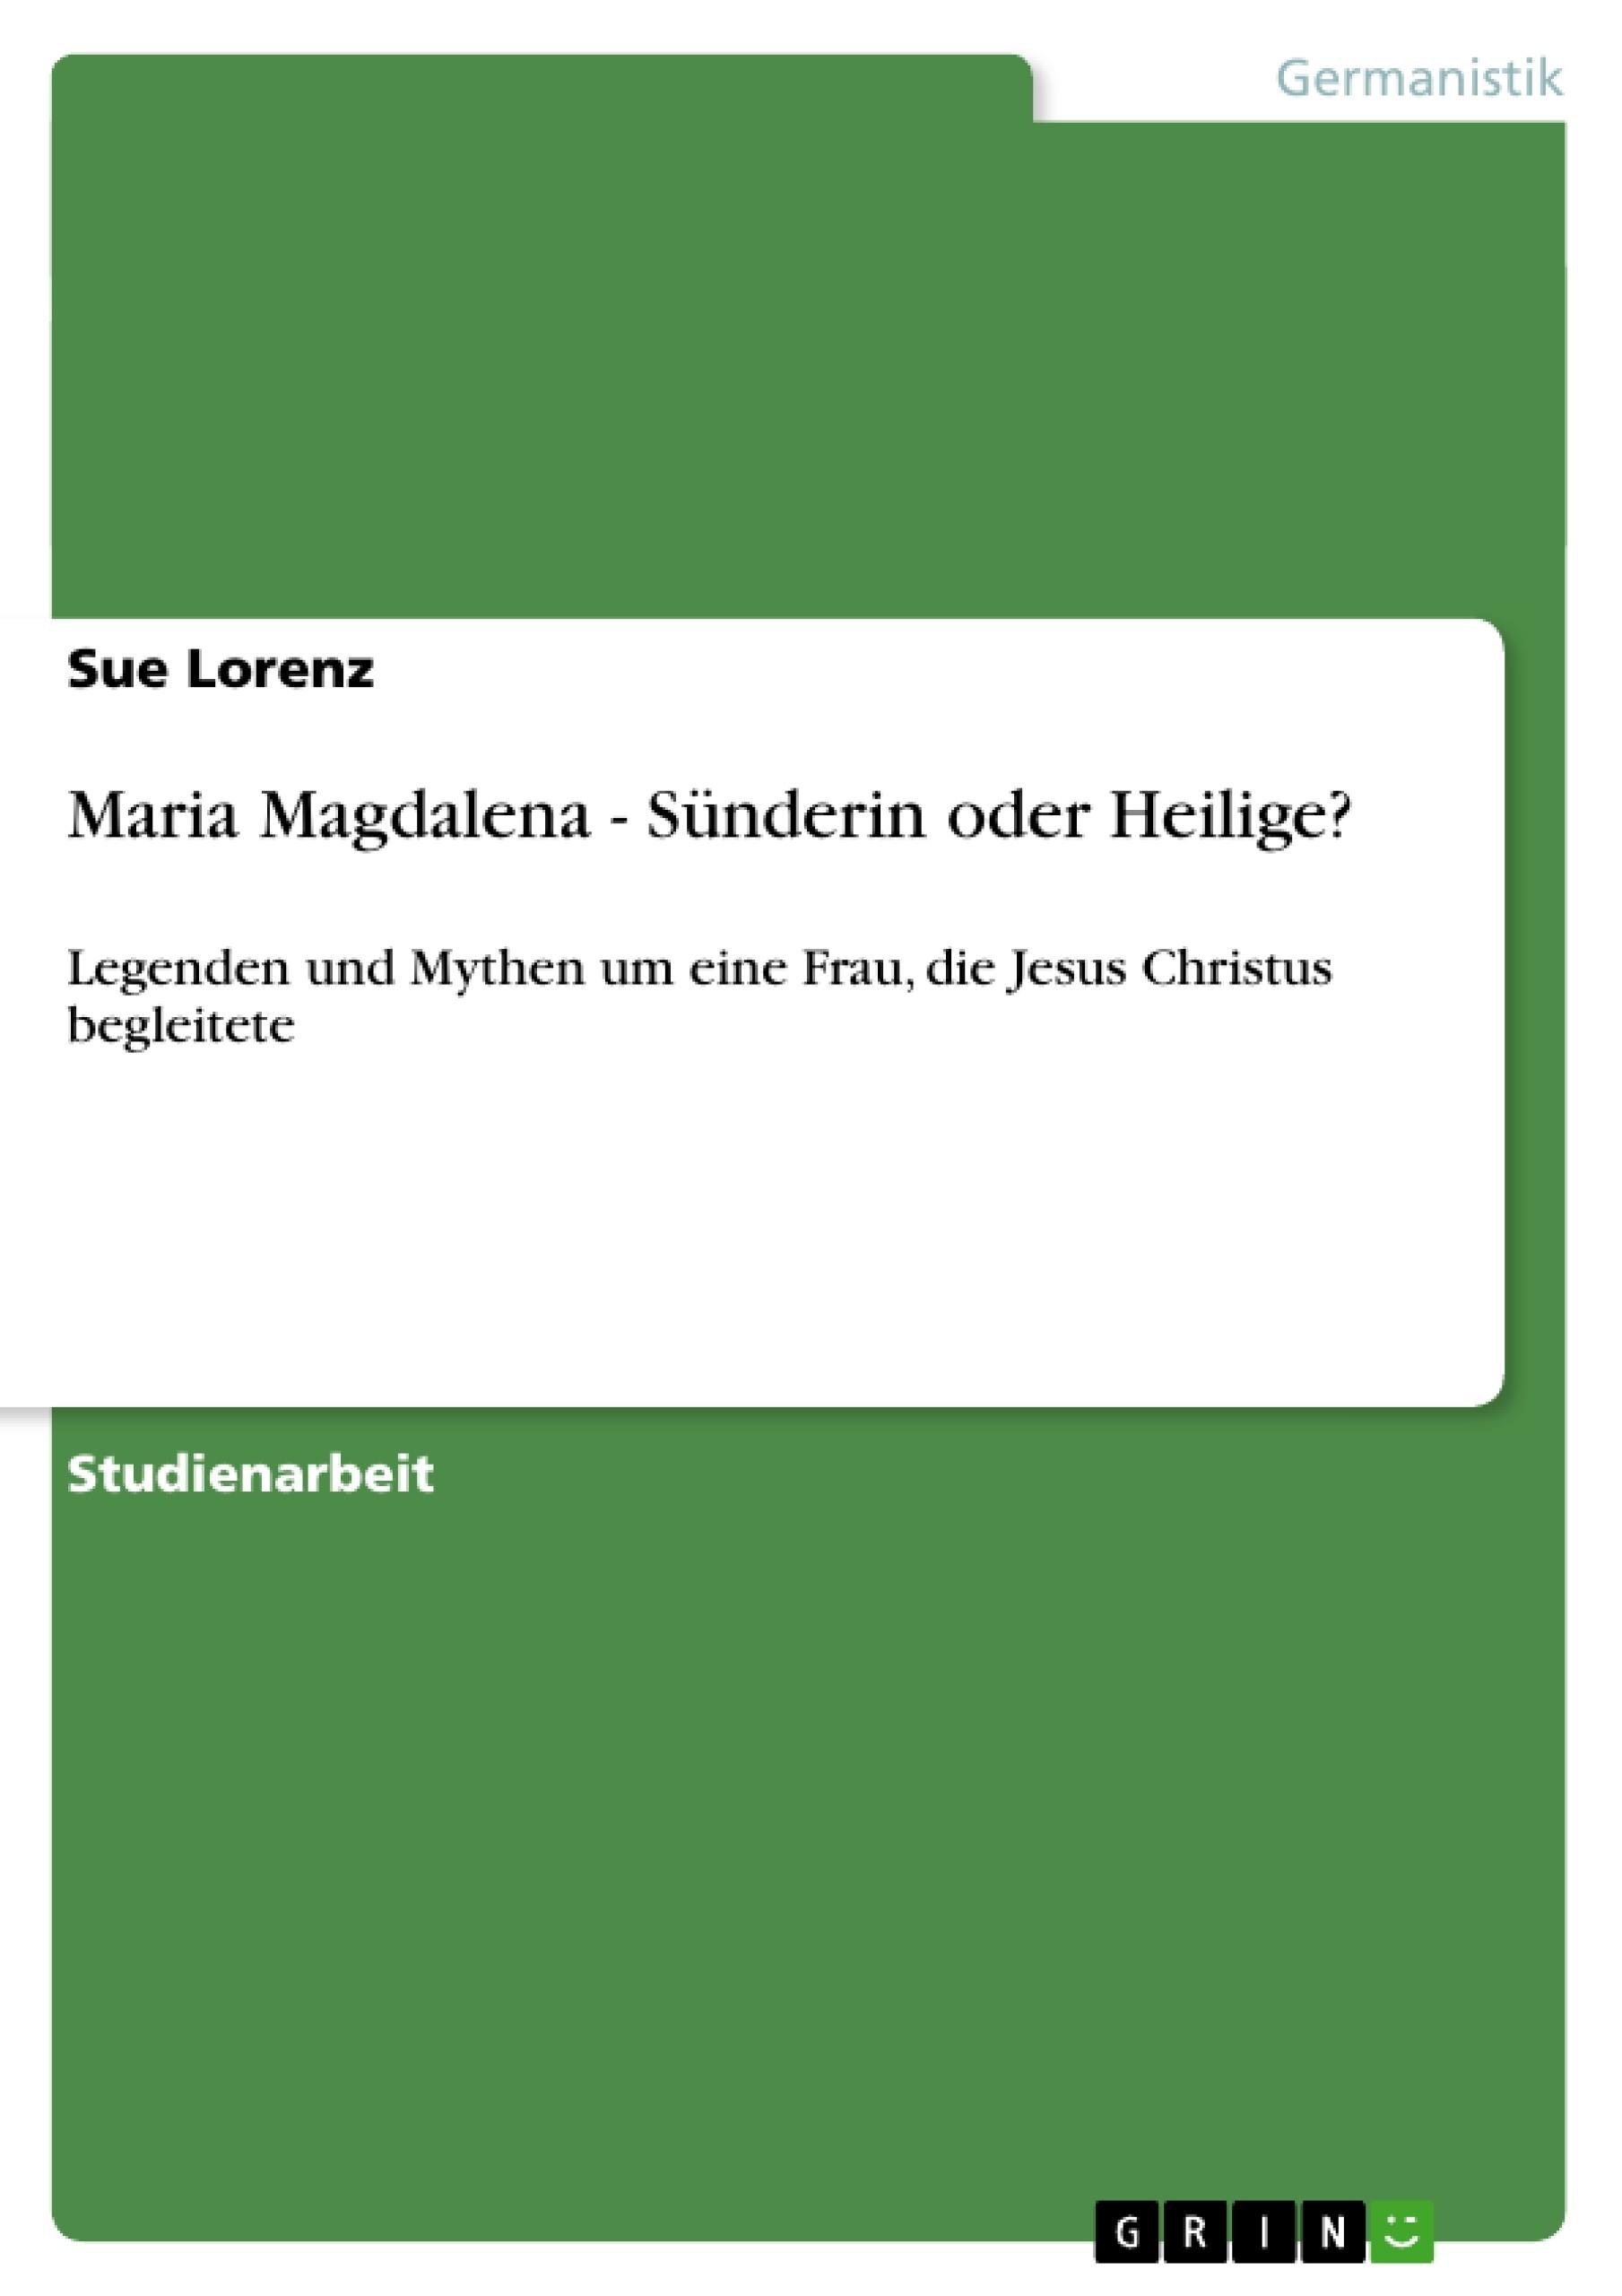 Titel: Maria Magdalena - Sünderin oder Heilige?